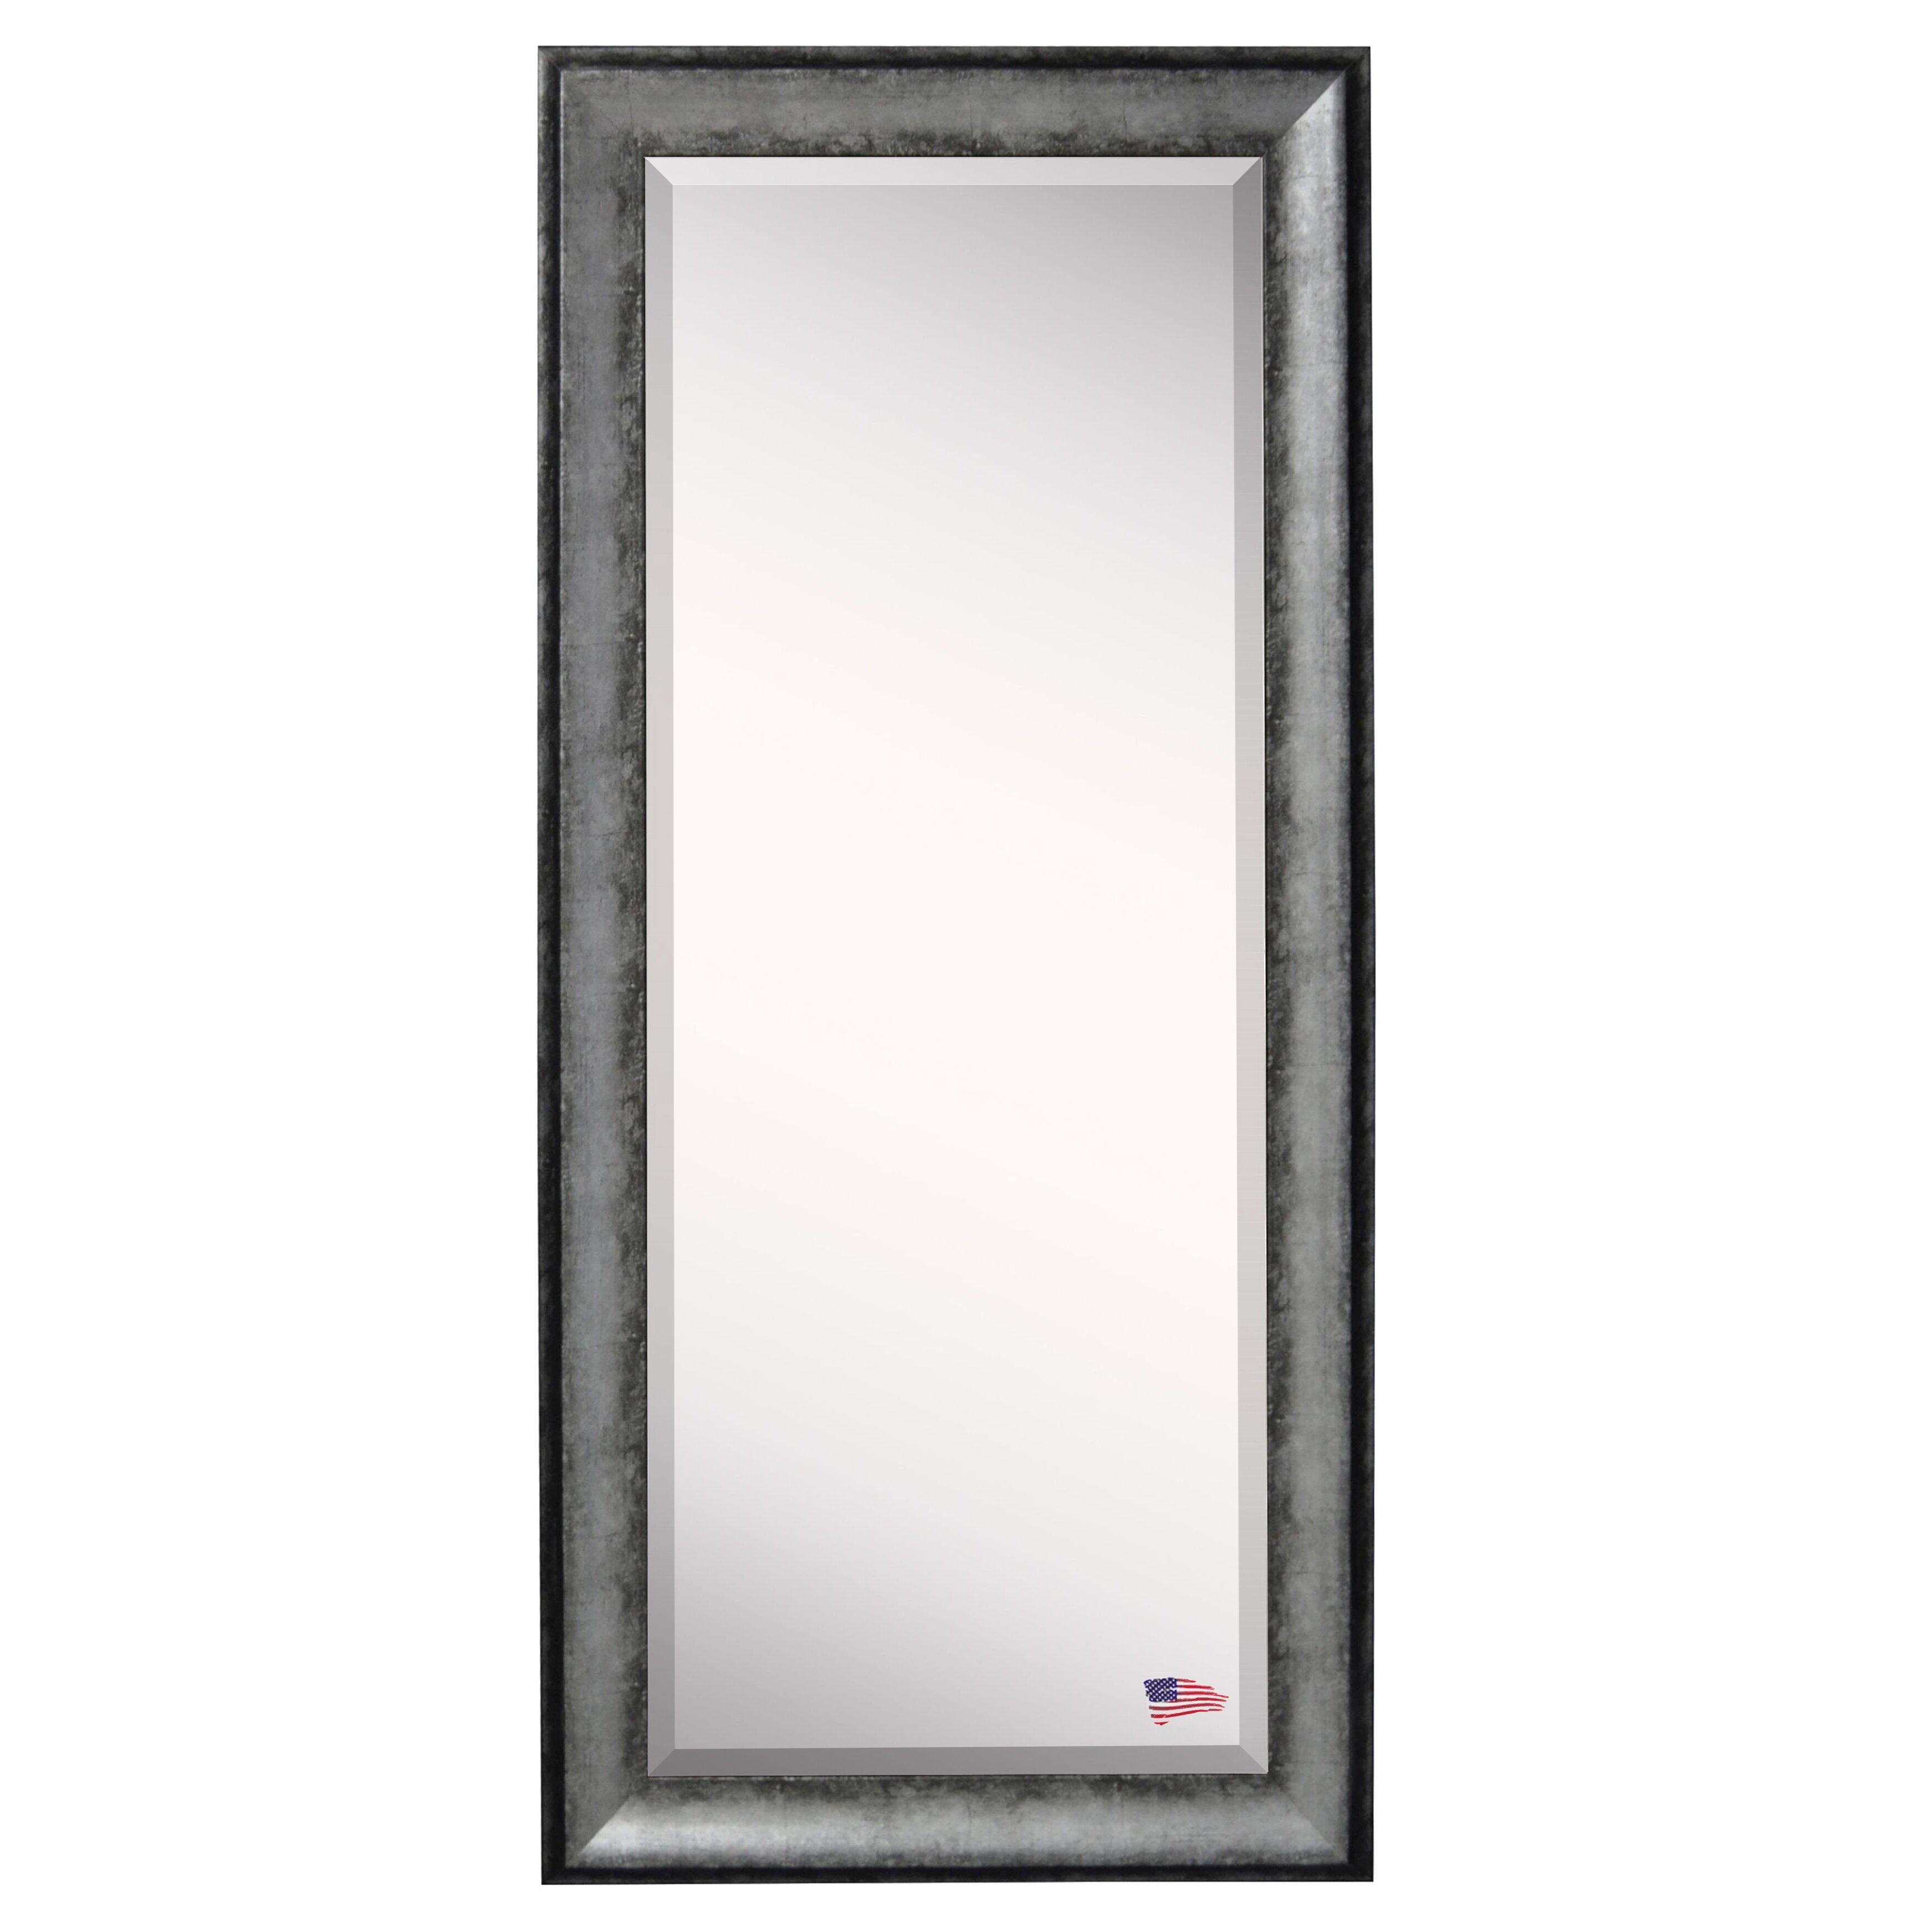 Trent austin design extra tall floor mirror reviews for Glass floor mirror